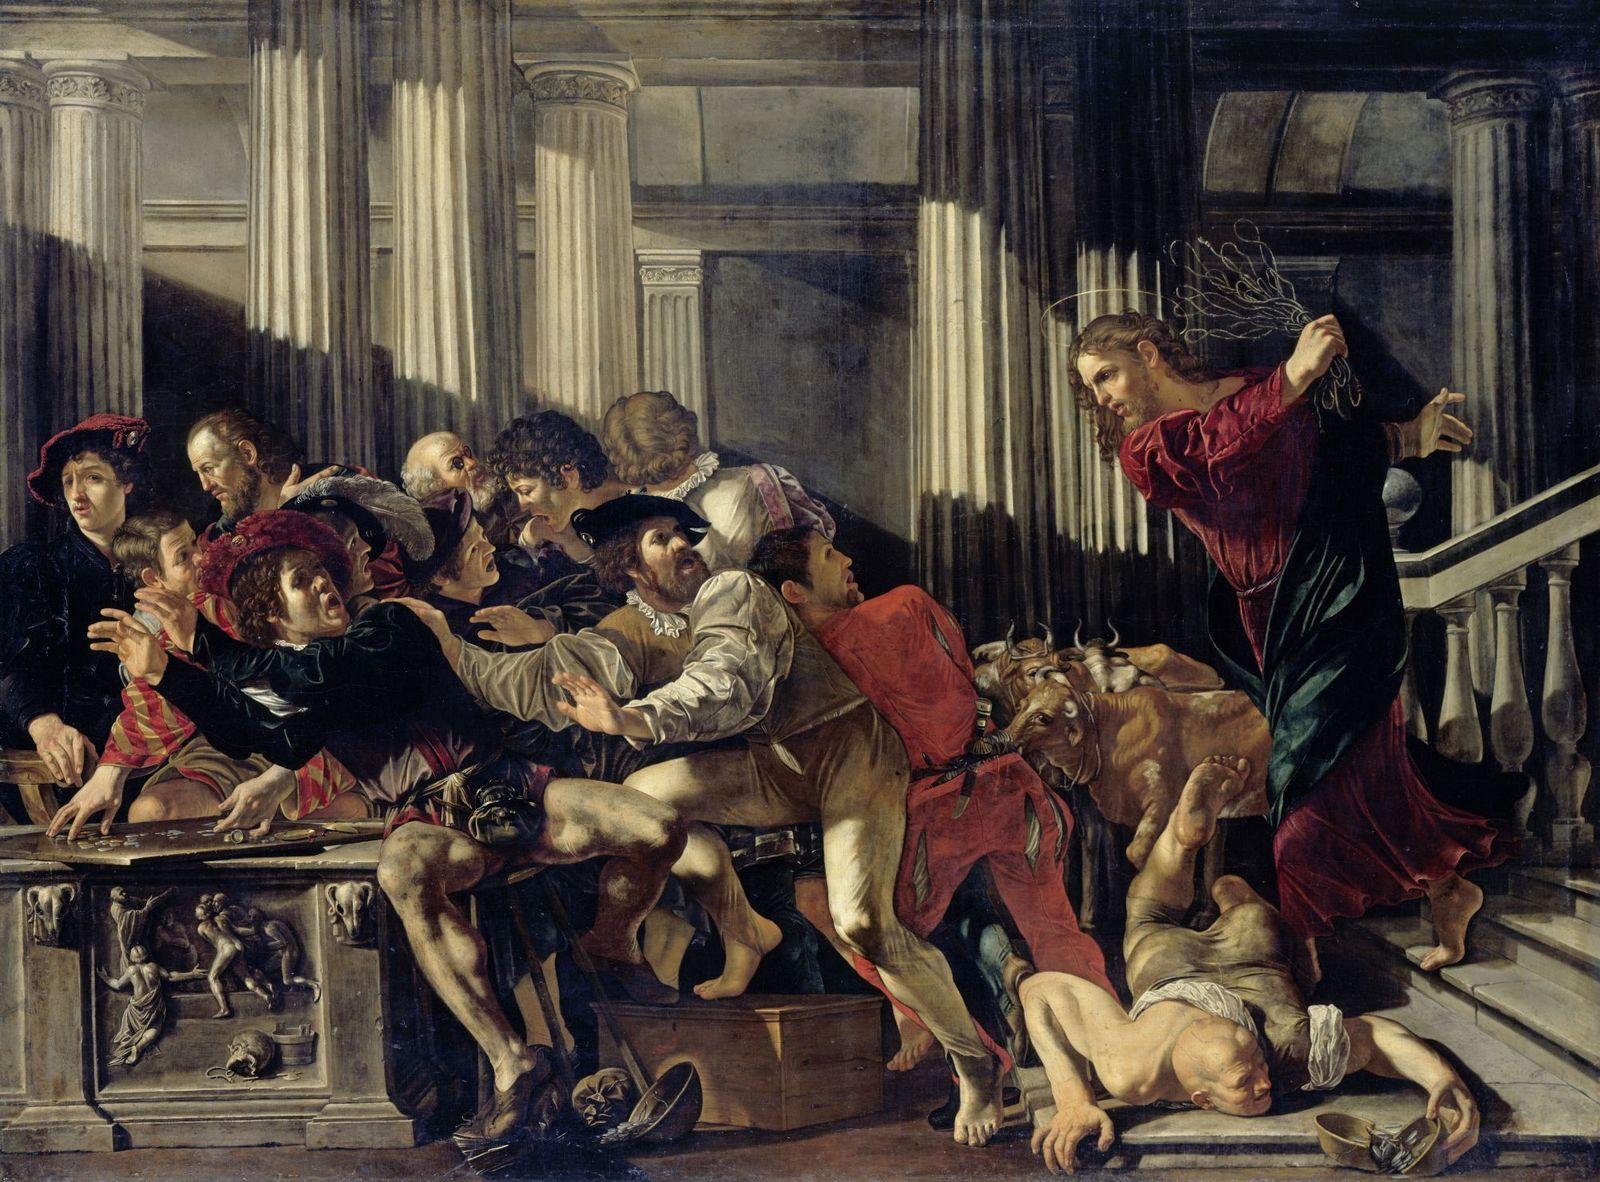 Francesco Boneri: Die Austreibung der Wechsler aus dem Tempel, um 1610 © bpk / Gemäldegalerie, SMB / Jörg P. Anders